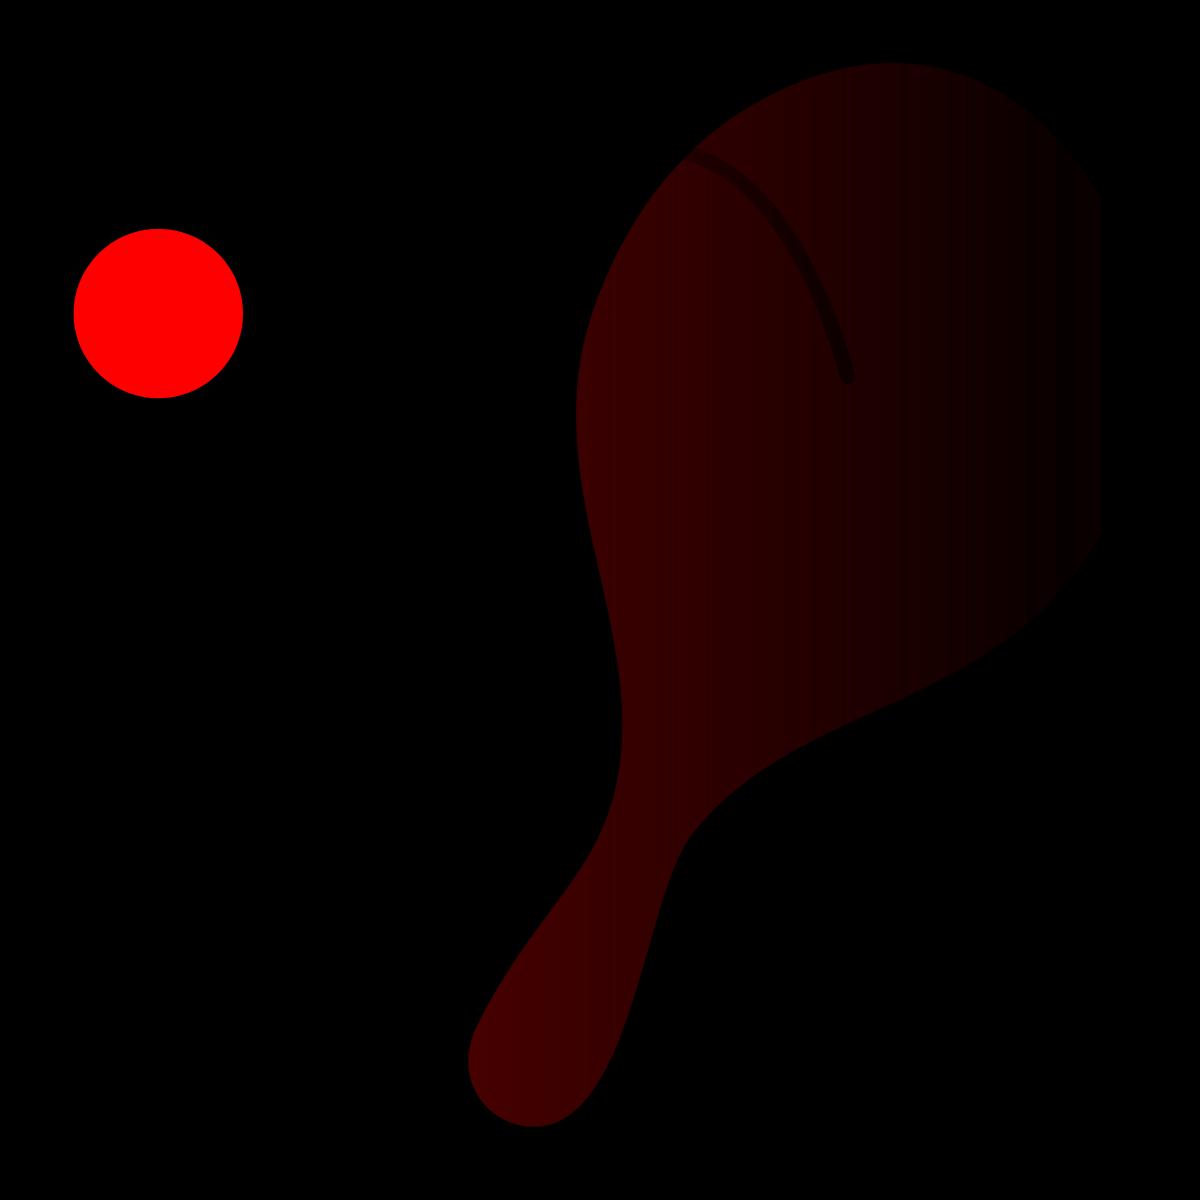 image freeuse download Paddle ball